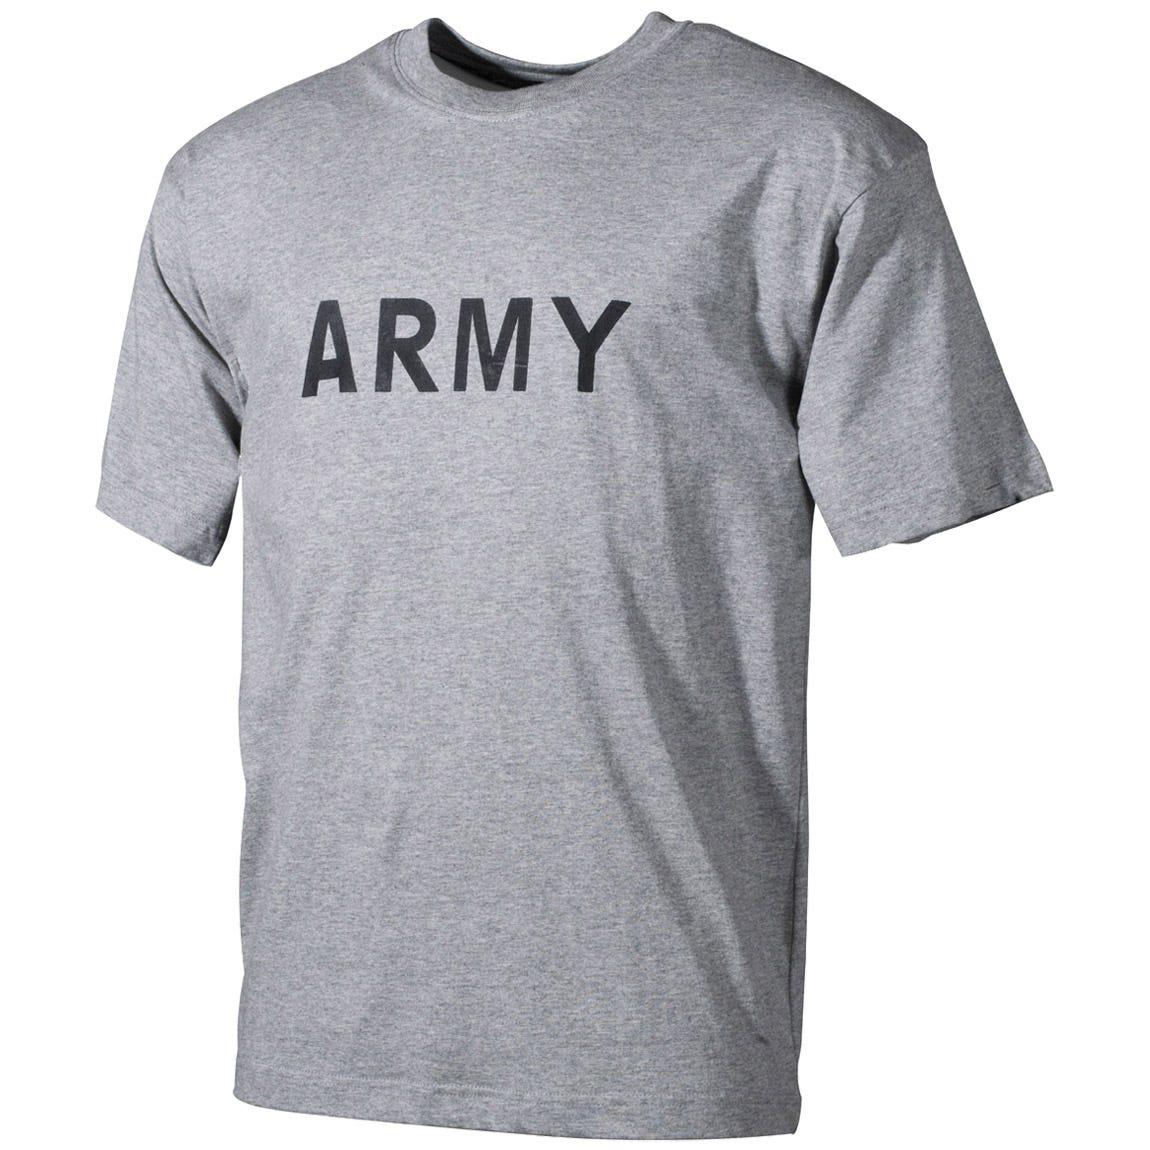 MFH T-shirt Grey with Army Print f41781539ed